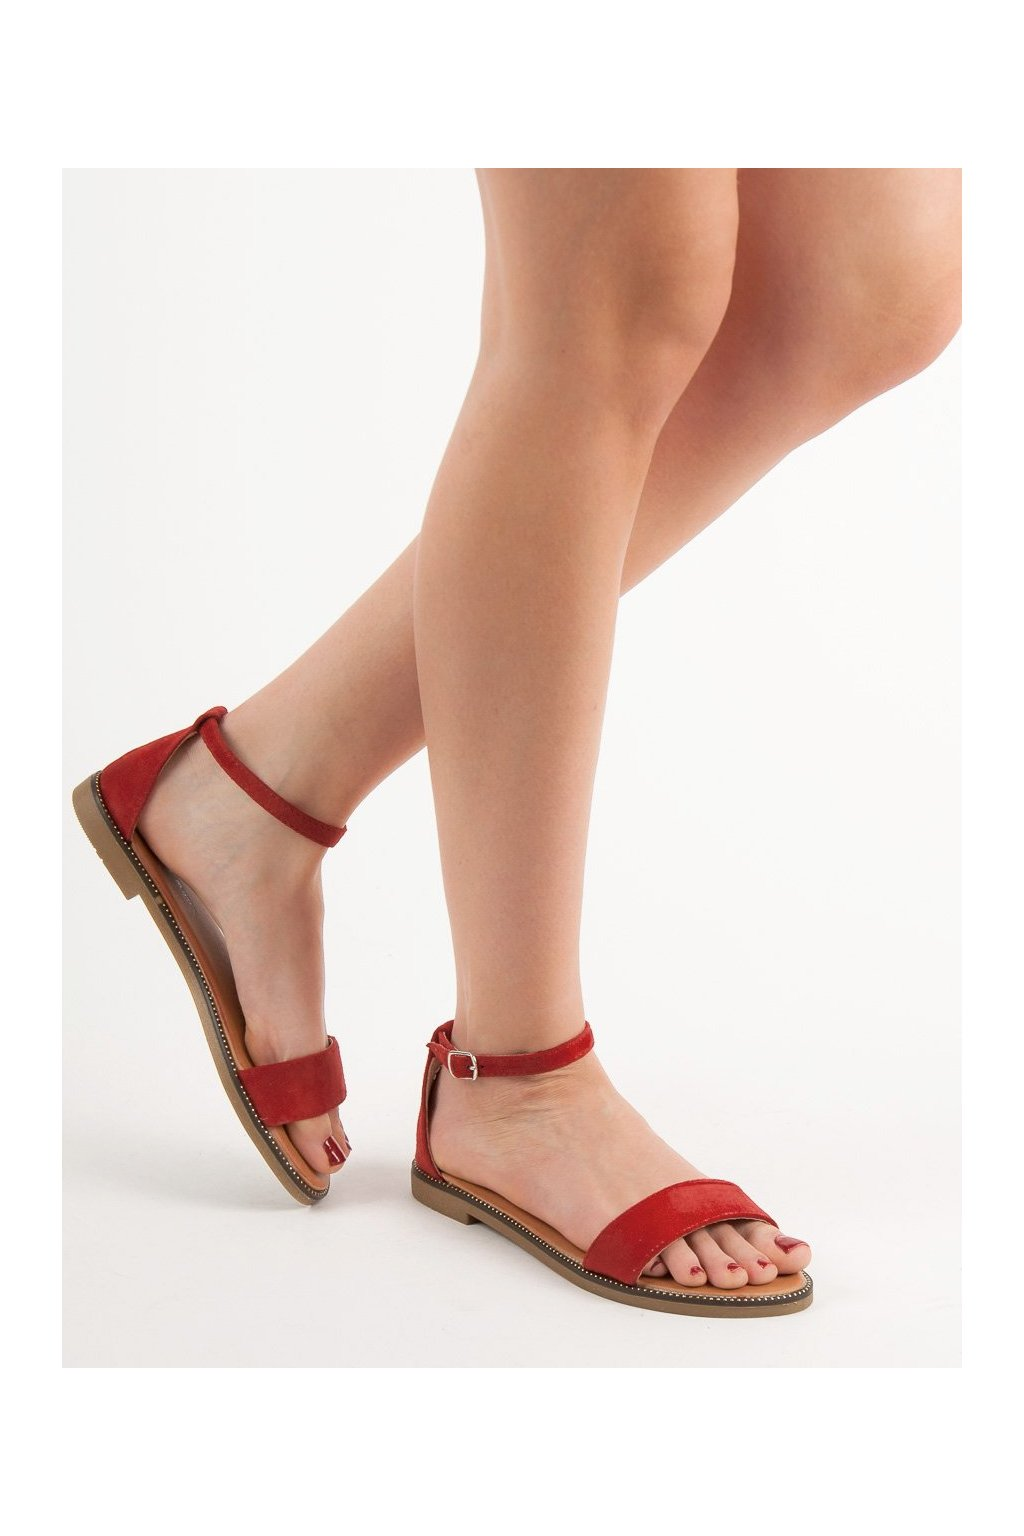 b3841201ae93 Vices sandale